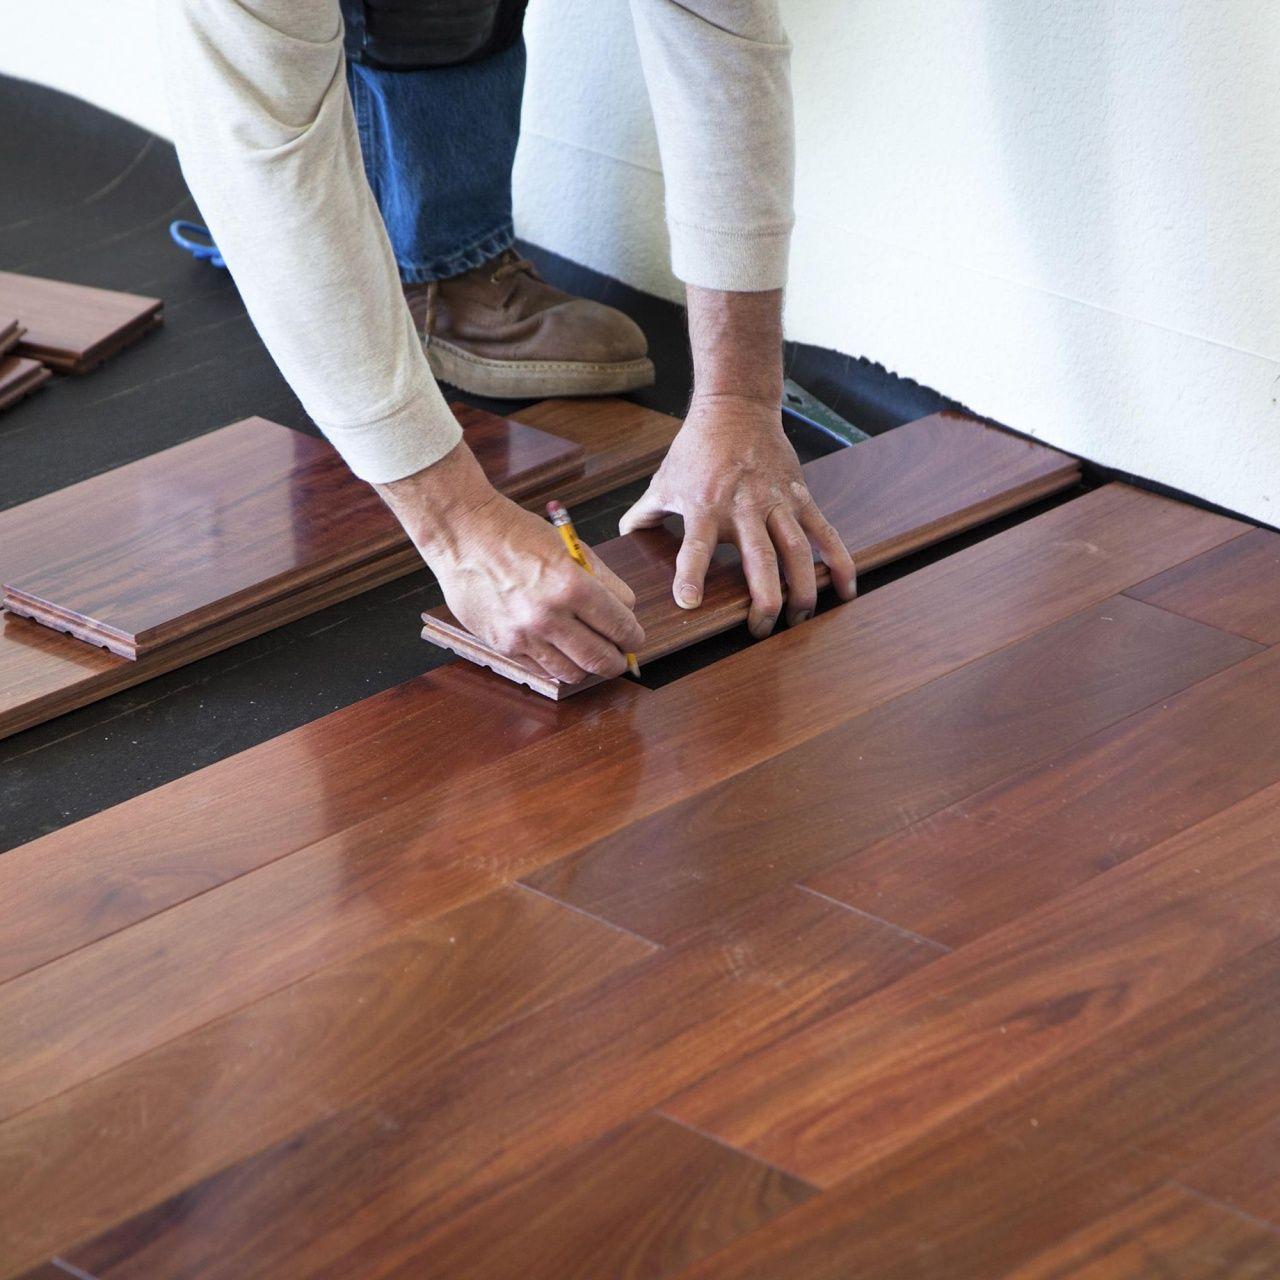 Laminate Flooring Installation Cost Per Sq Ft In 2020 Flooring Refinishing Hardwood Floors Flooring Contractor